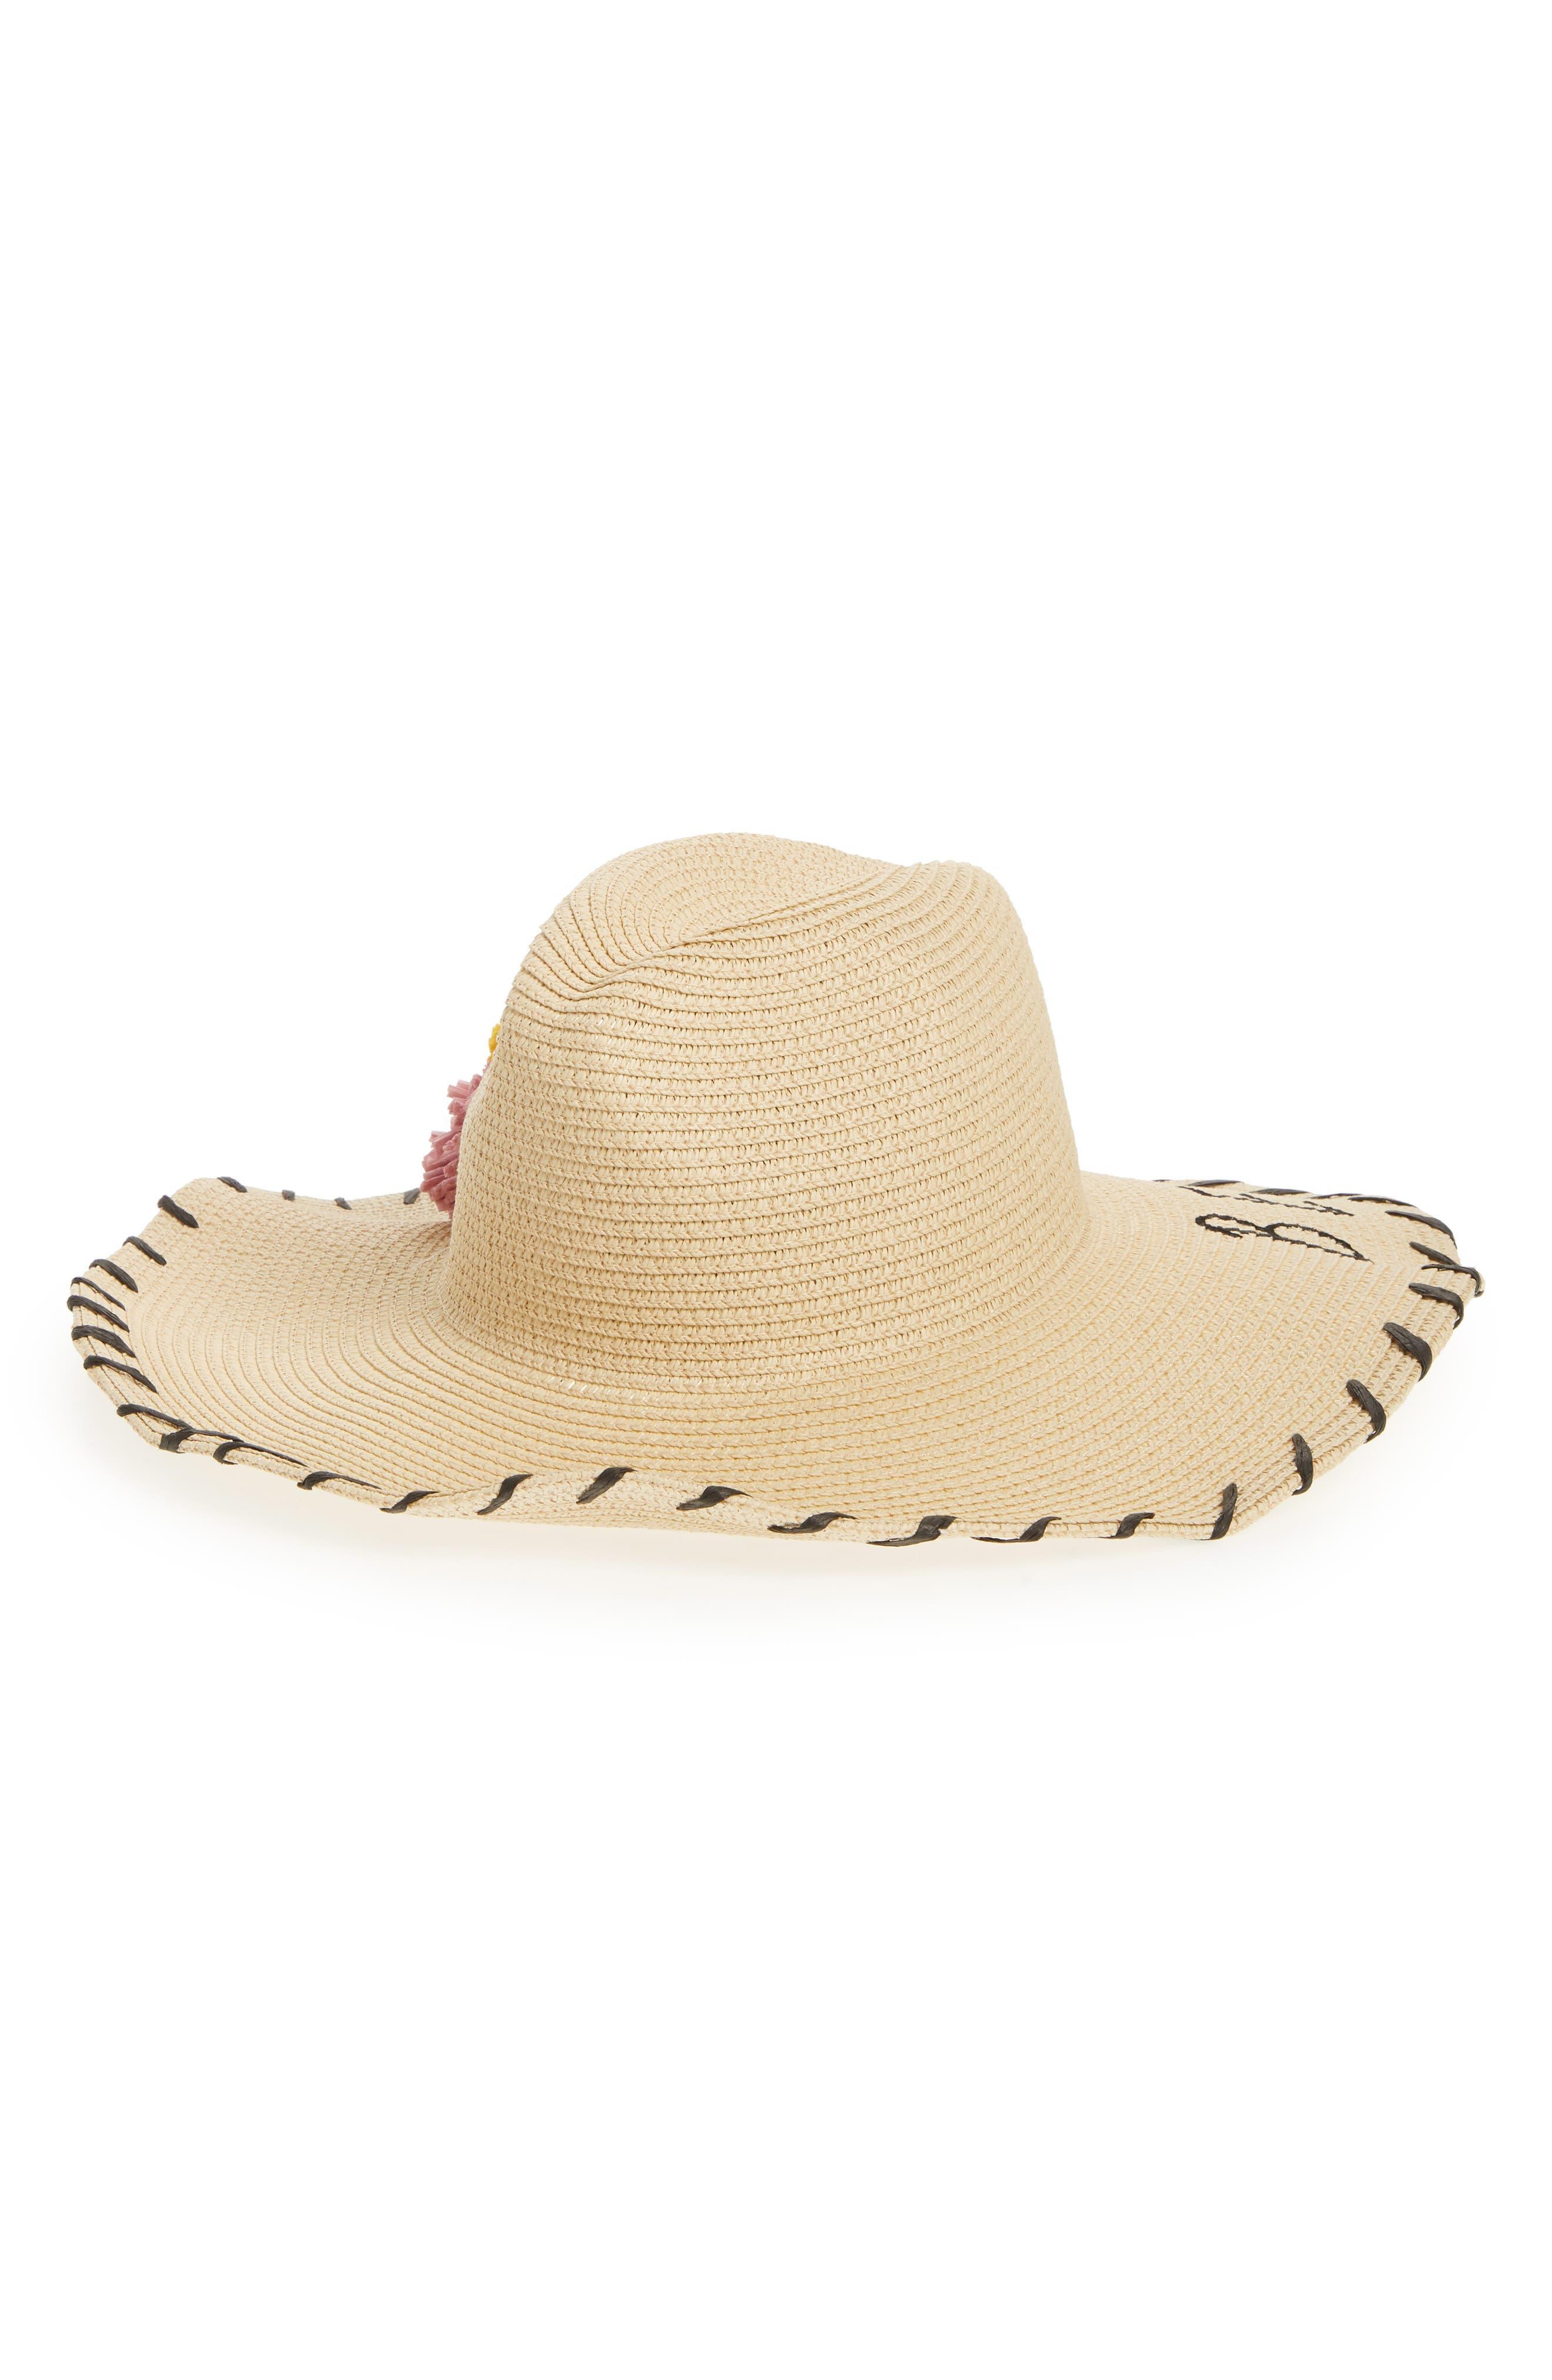 Verbiage Pom Straw Panama Hat,                             Main thumbnail 1, color,                             250